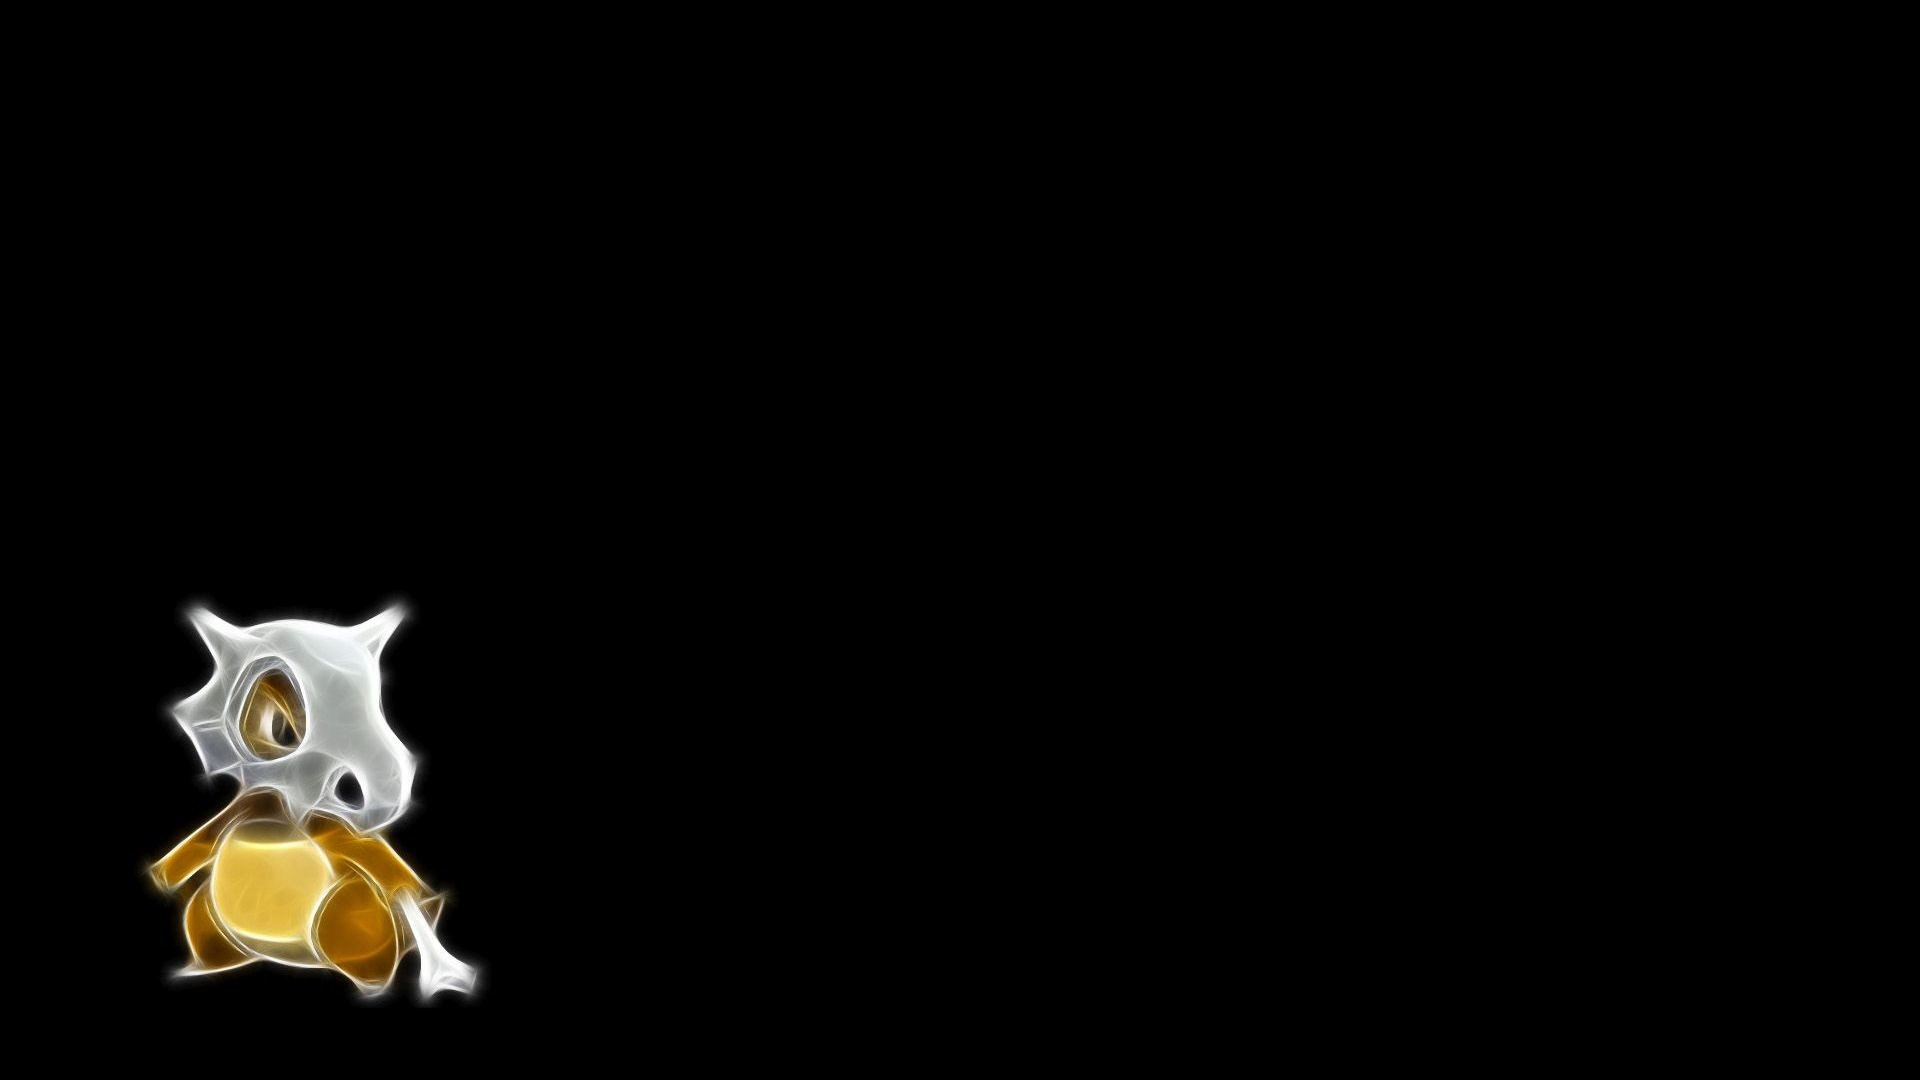 Res: 1920x1080, Cubone - Pokemon HD Wallpaper  Cubone ...